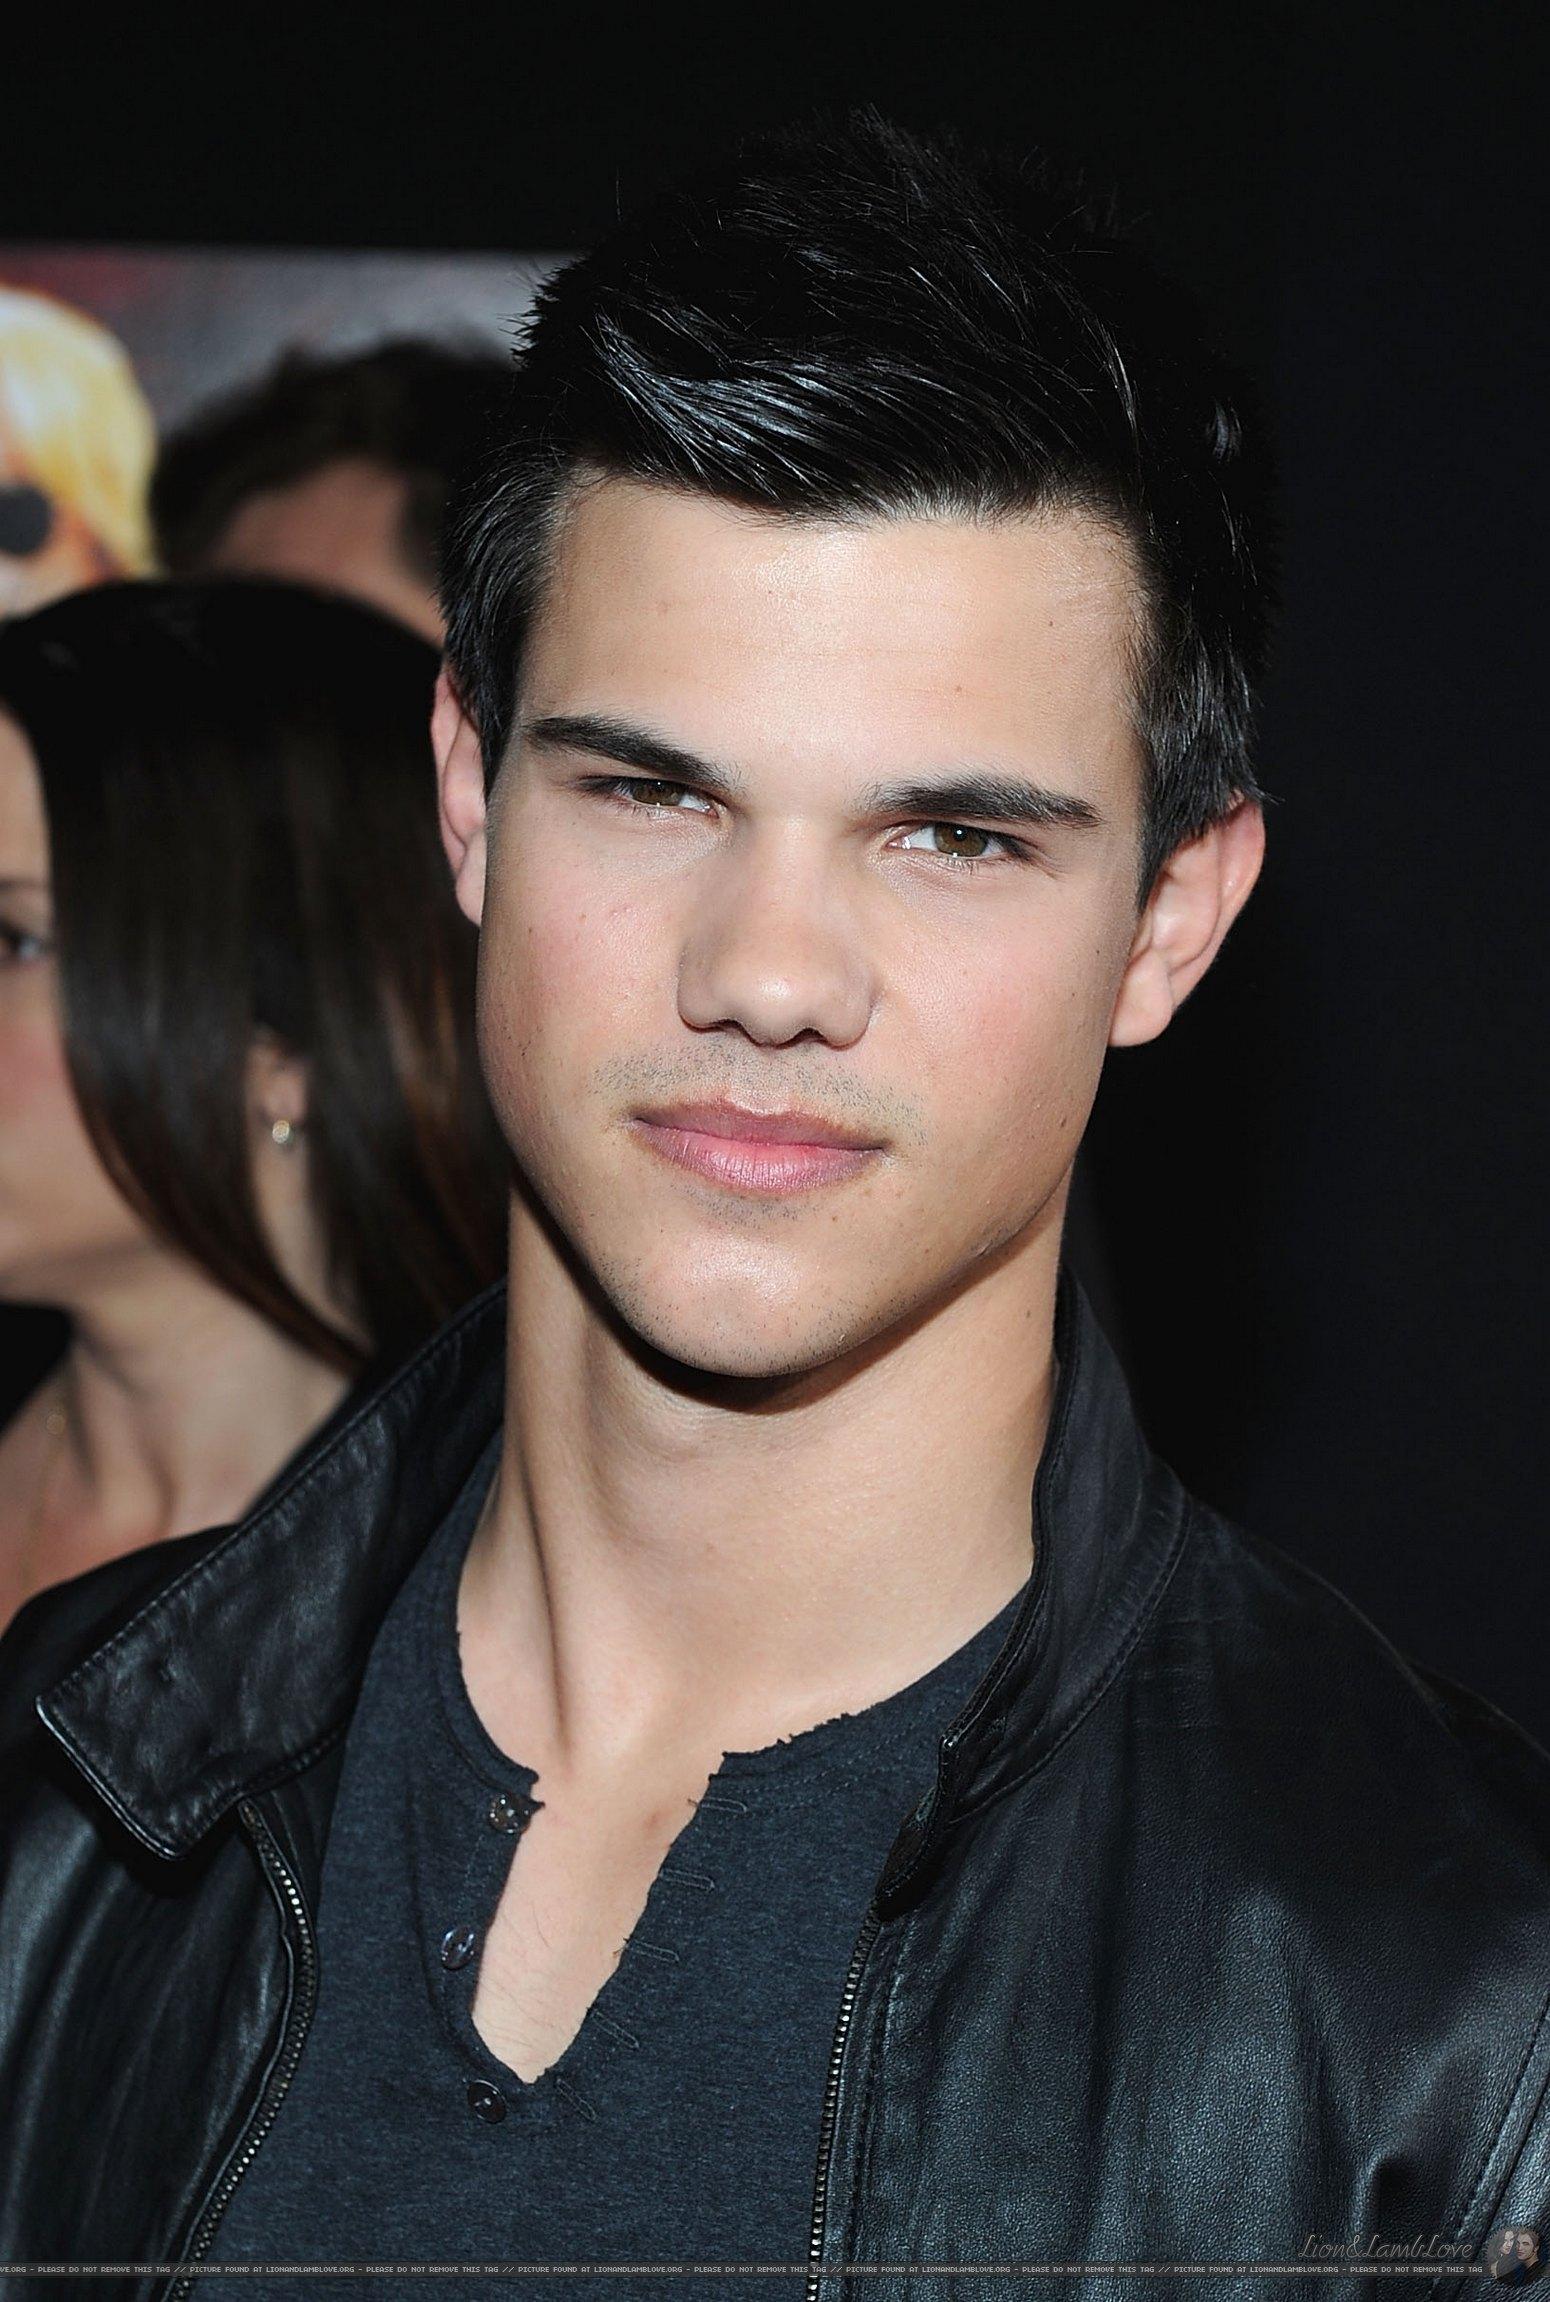 Taylor Lautner - Twilight Saga Wiki